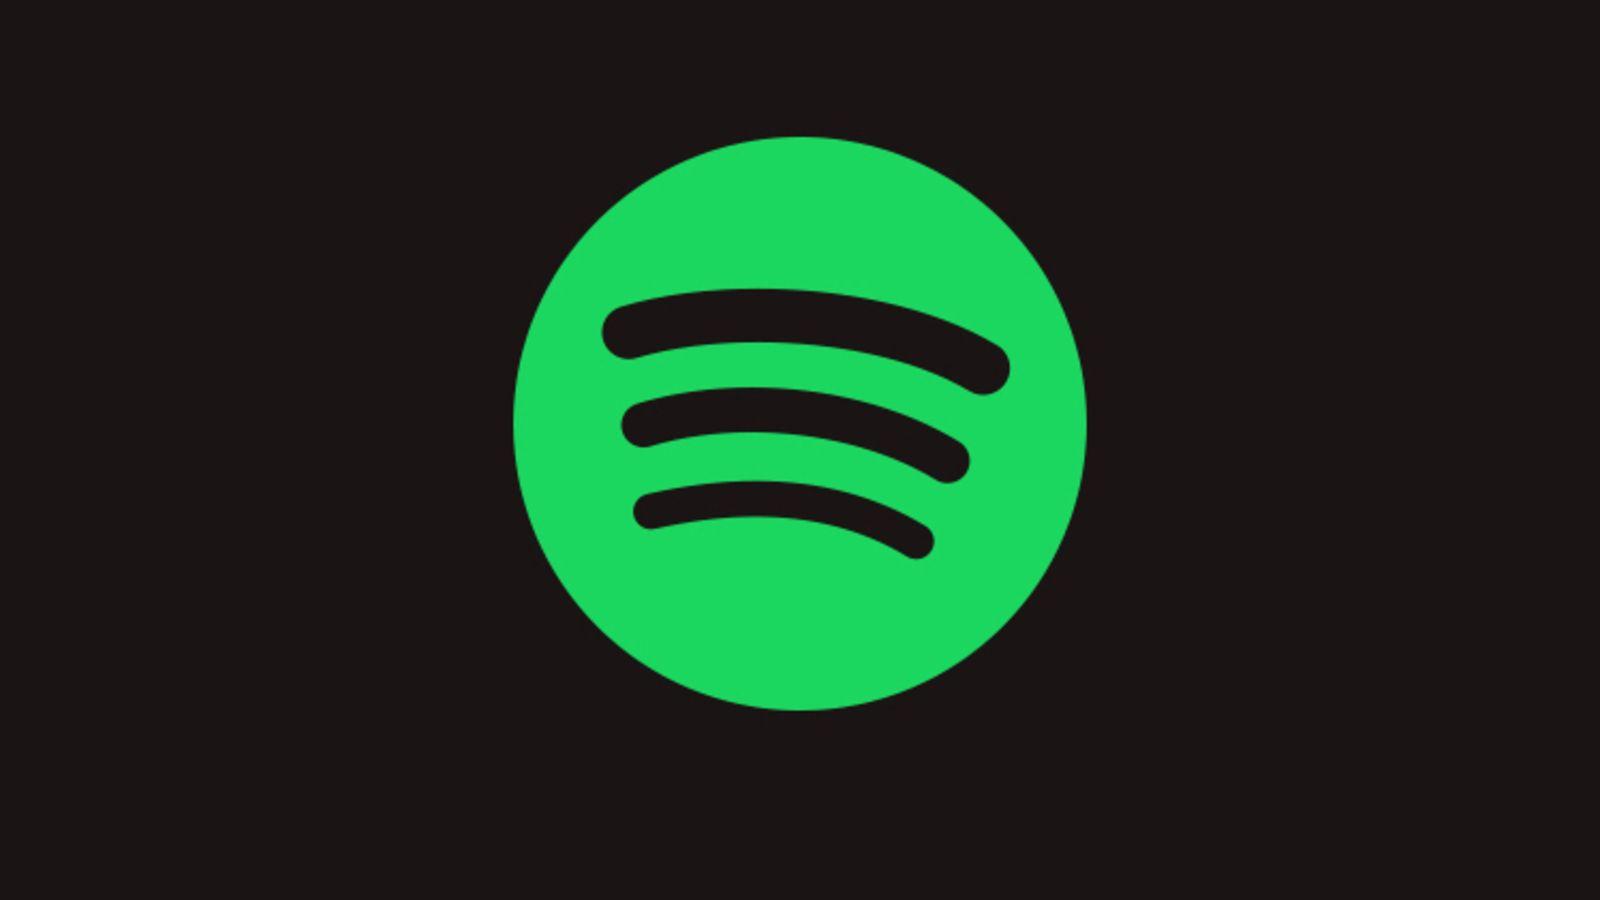 spotify logo.jpg